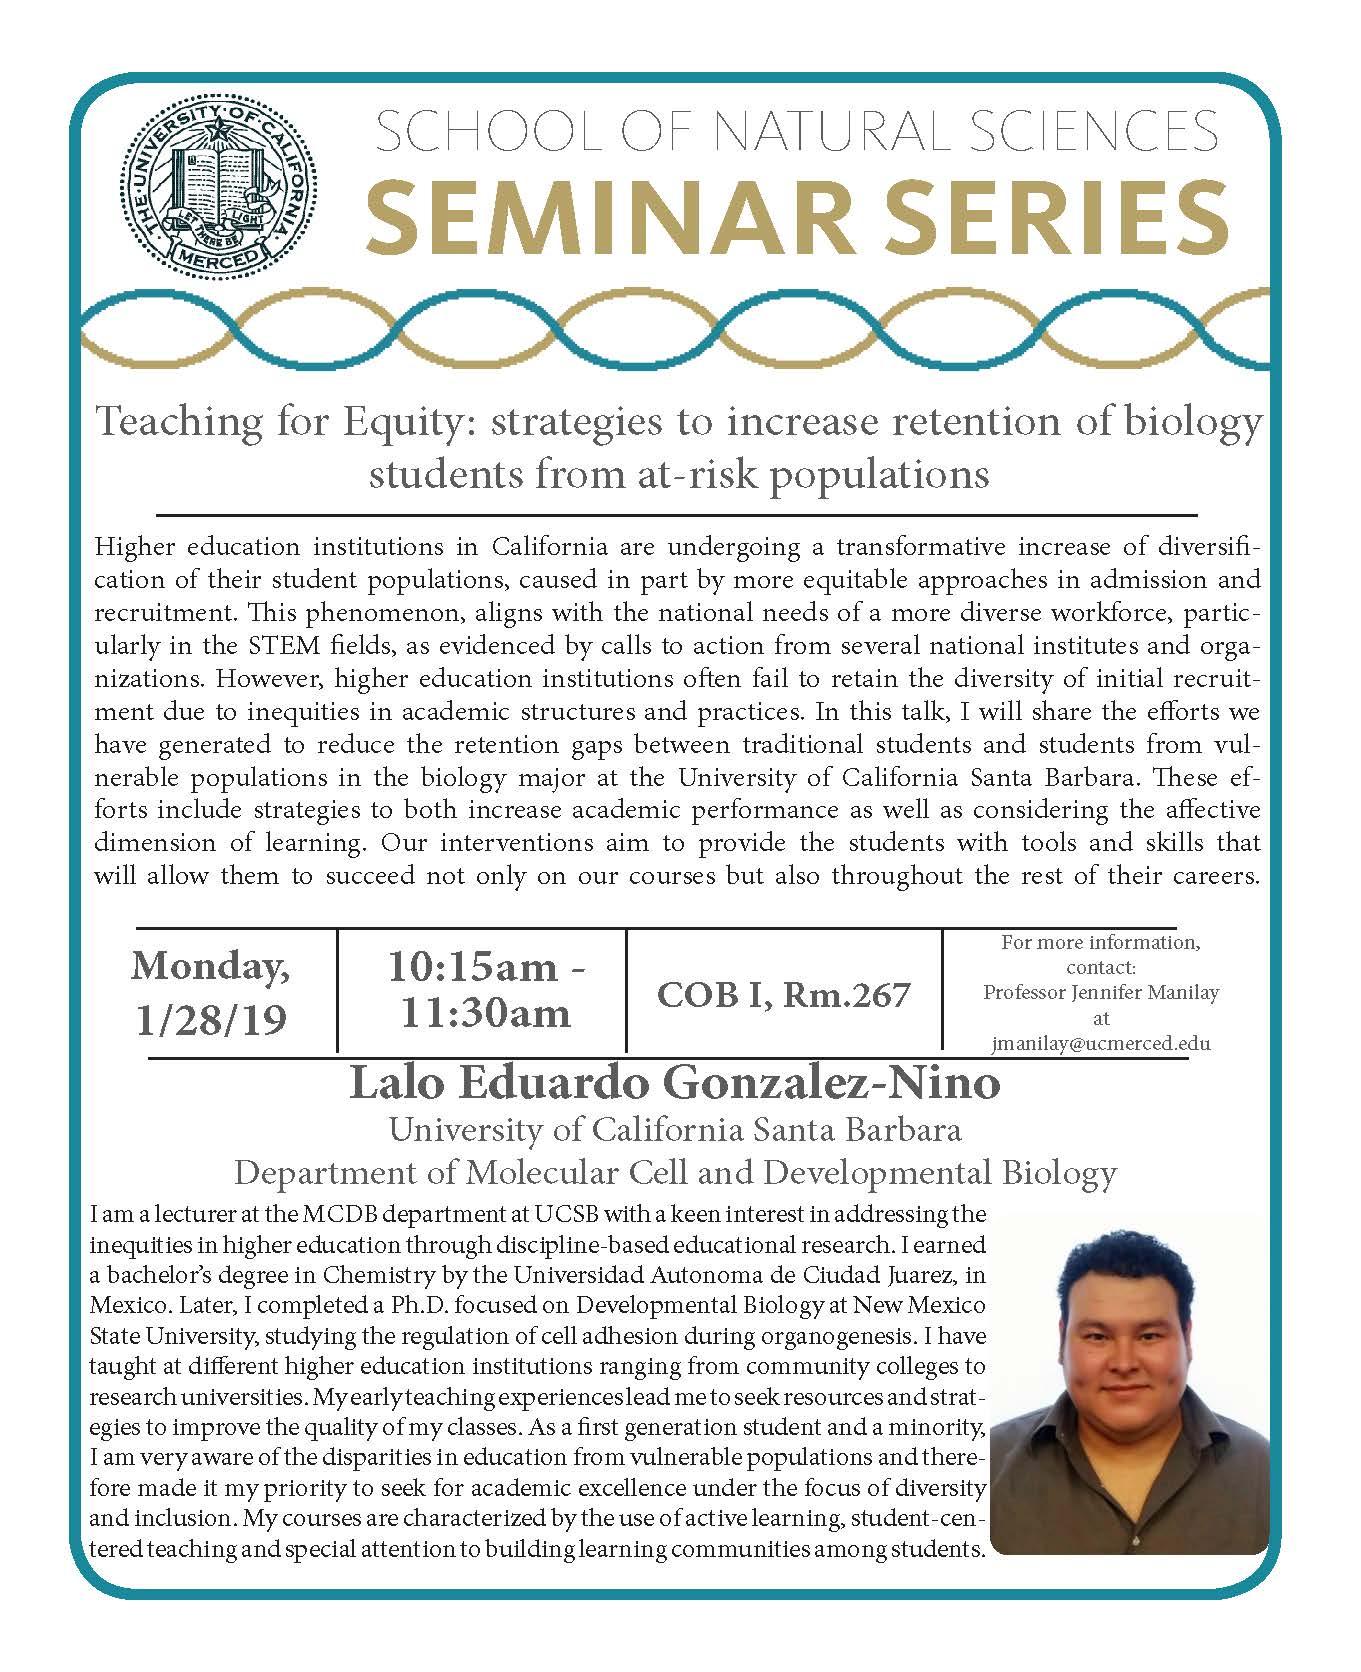 MCB Seminar - Dr. Lalo Eduardo Gonzalez-Nino